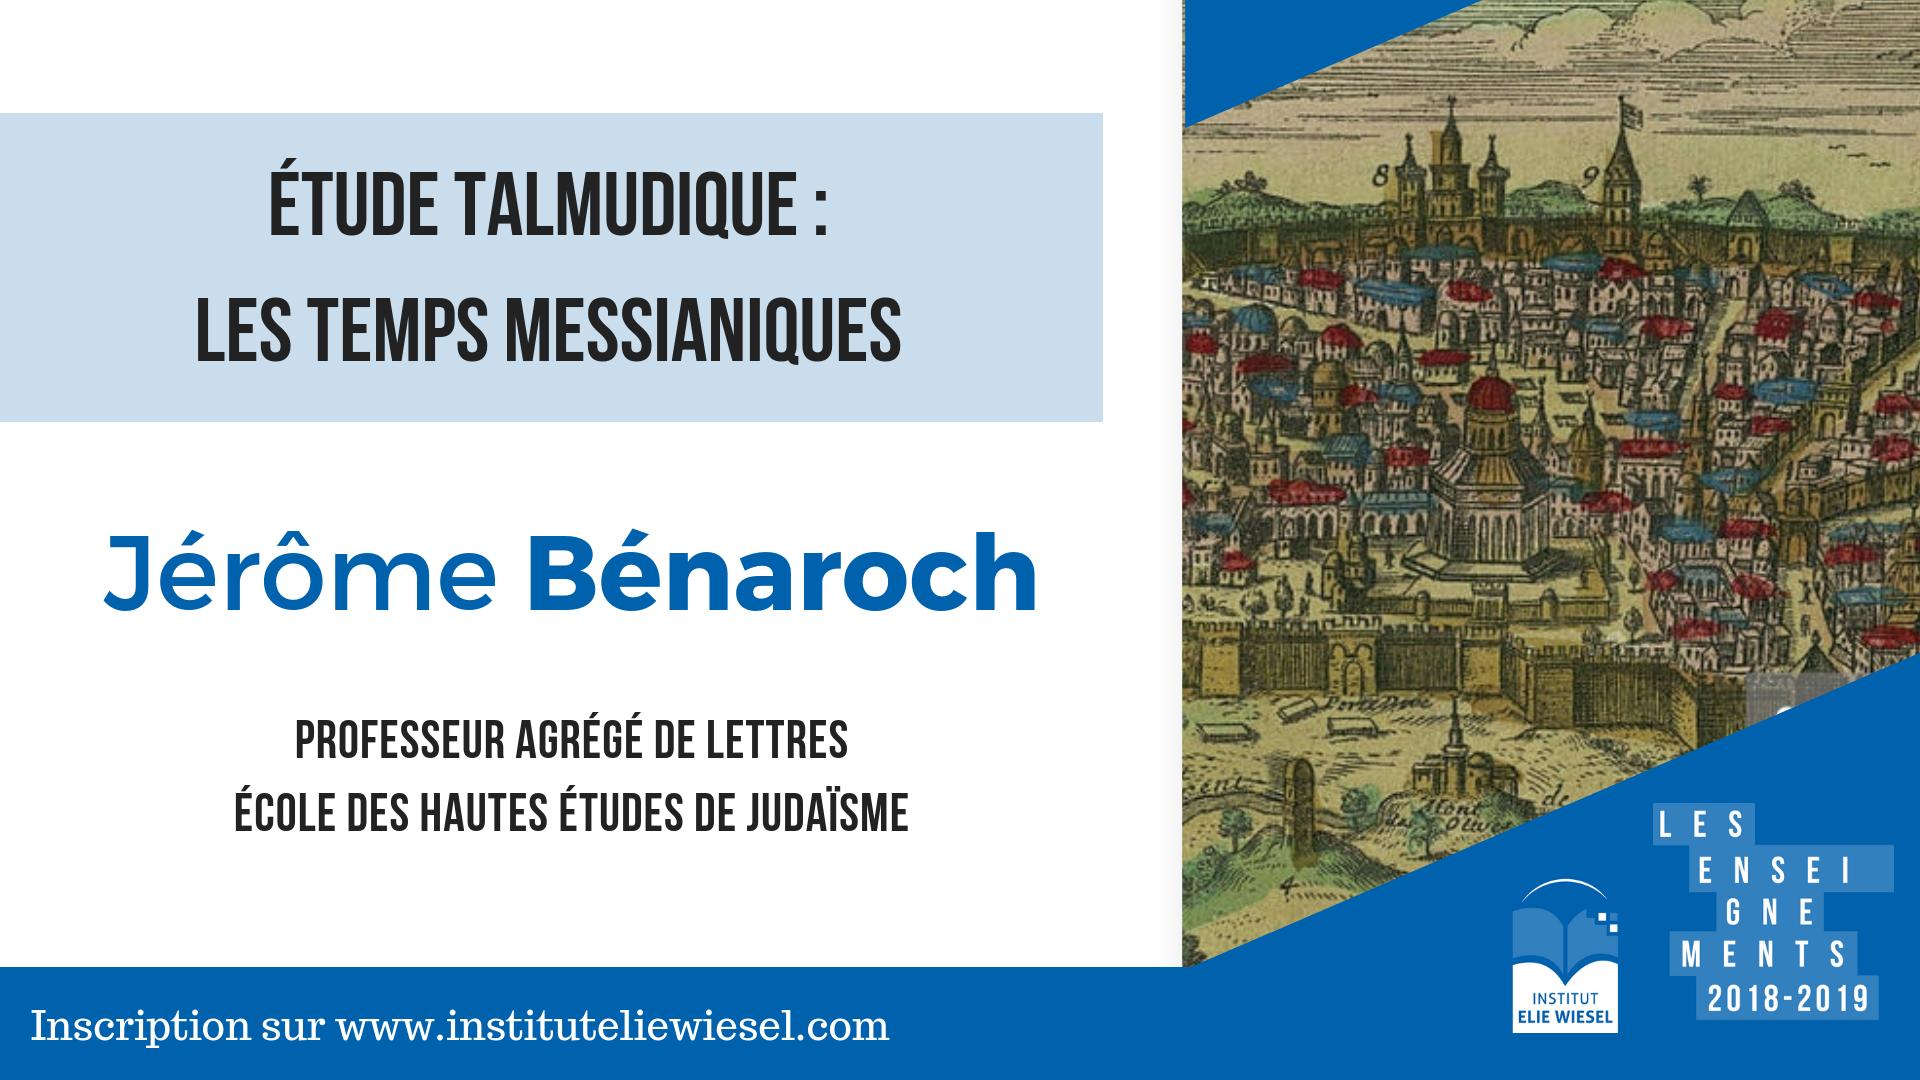 Etude talmudique : Les temps messianiques, avec Jérome Benarroch